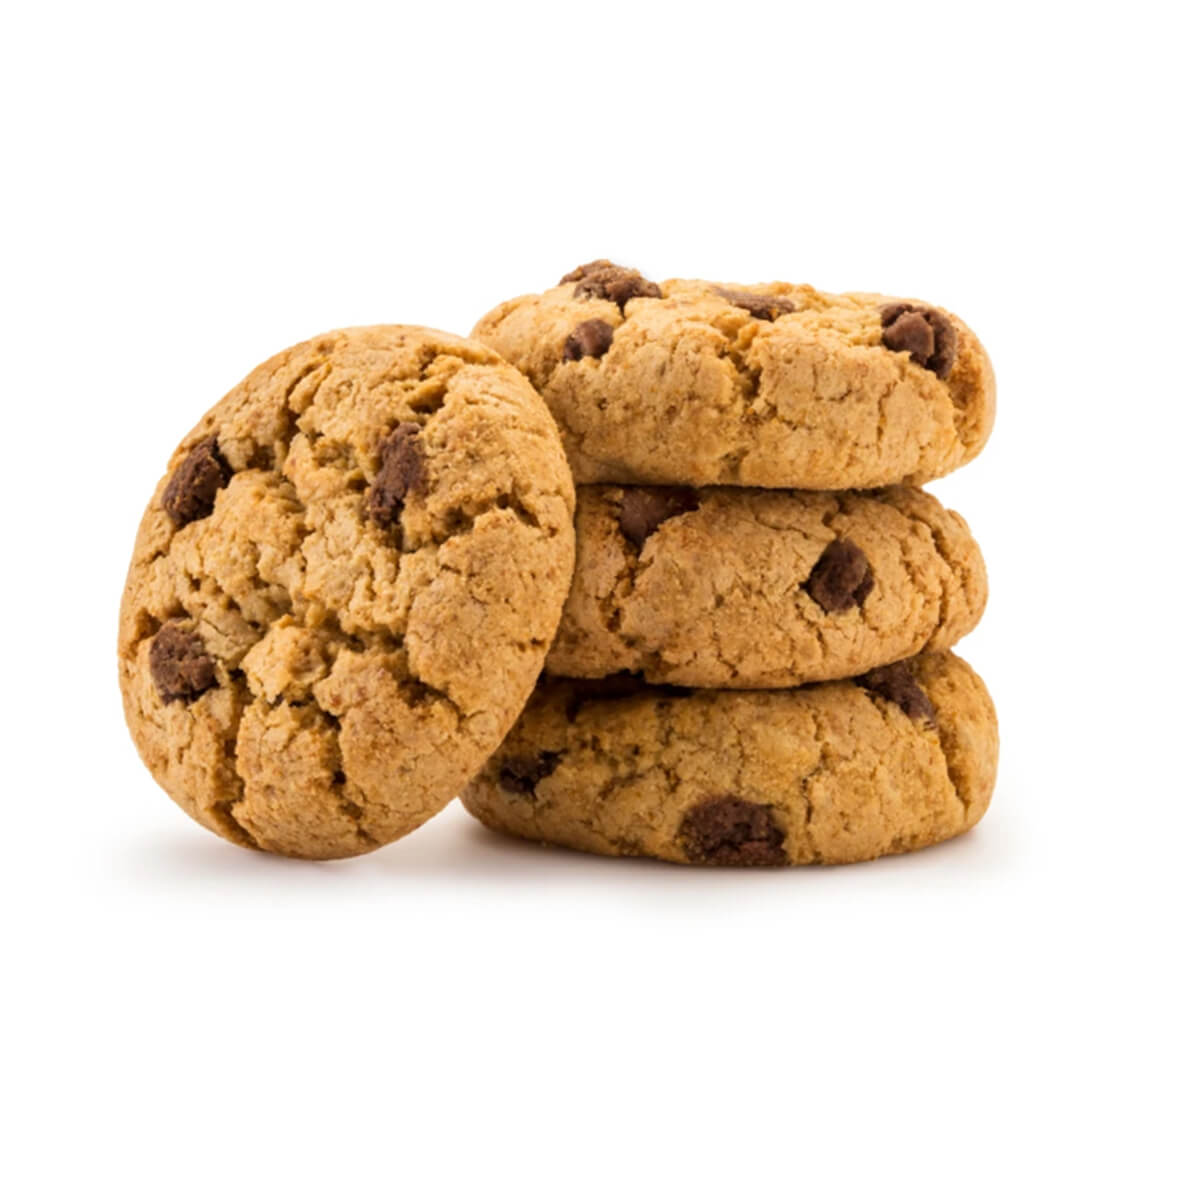 Partake Crunchy Chocolate Chip Cookies - cookie